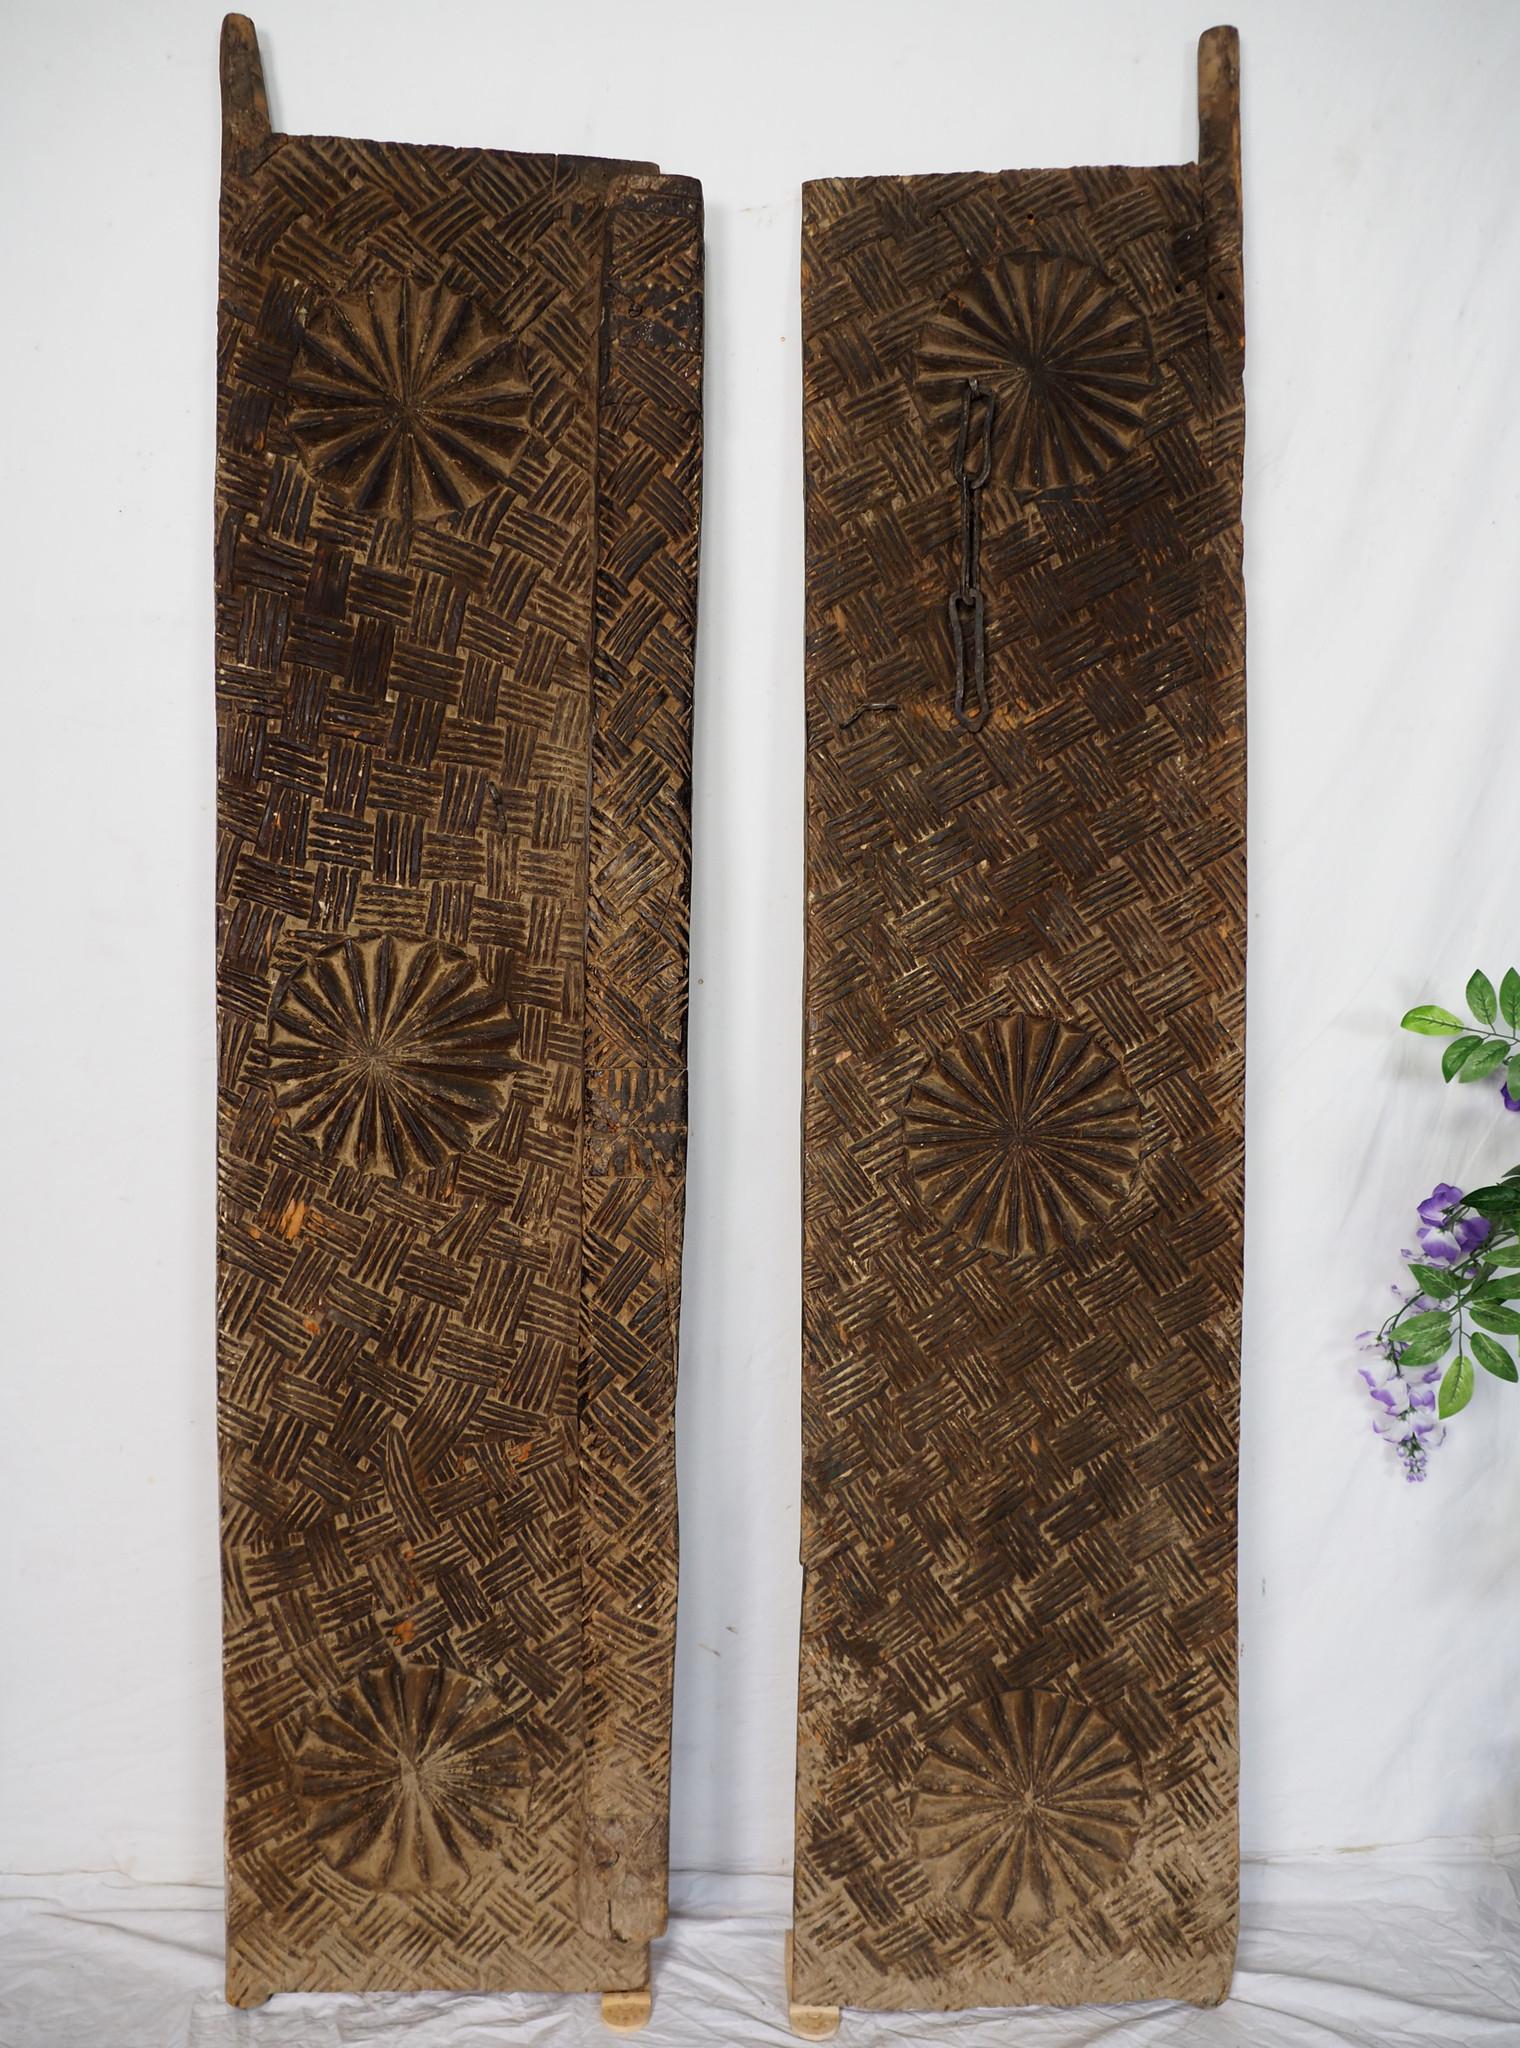 Antique orient vintage carved wooden Door from Nuristan Afghanistan WAL